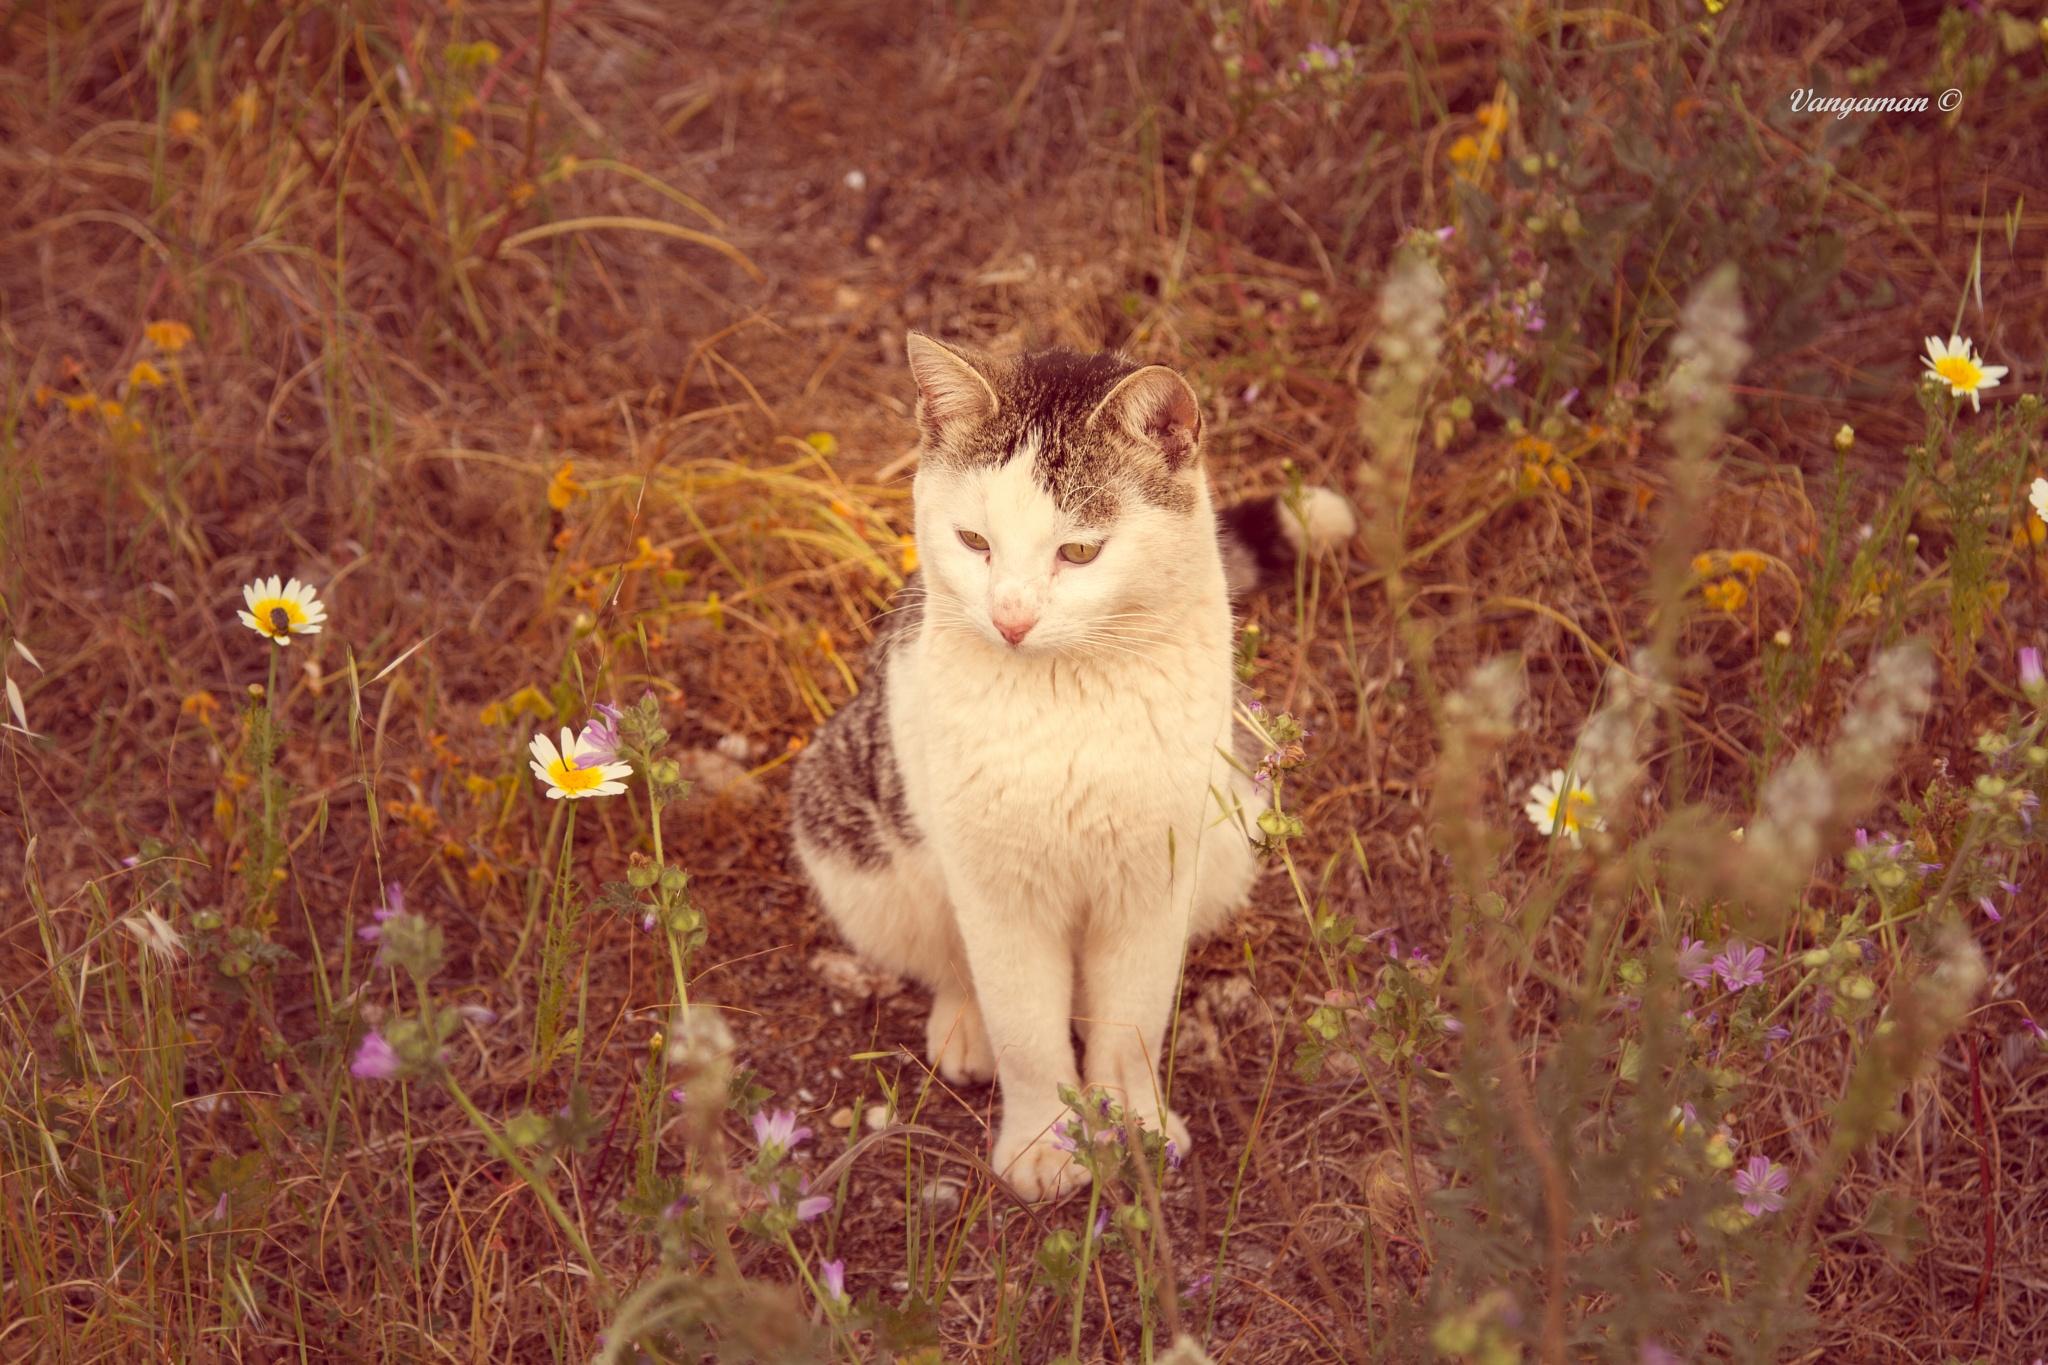 Vangaman-animals by Evangelos Astropalitis